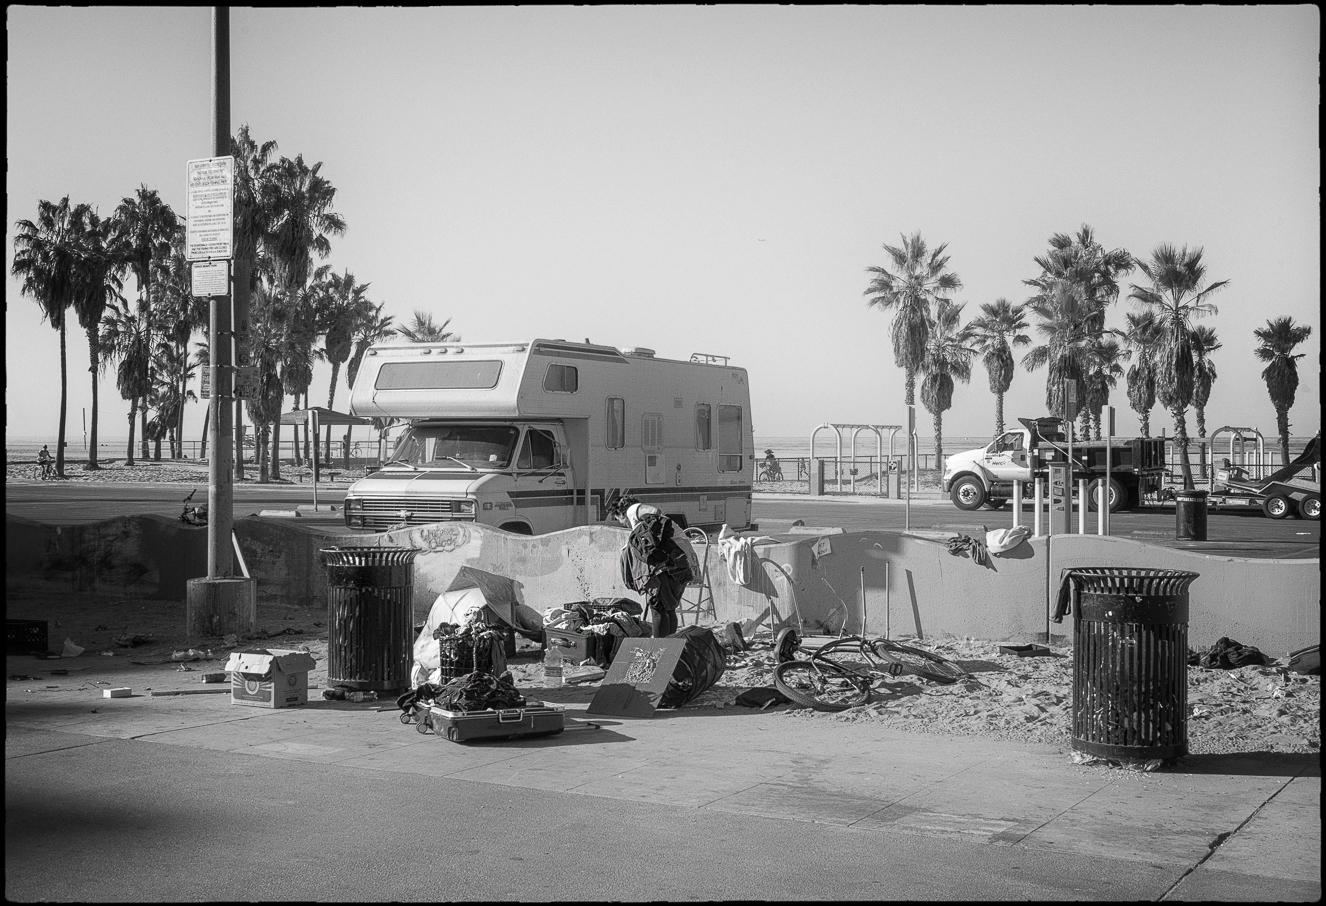 Ed_Simmons_street_art_venice_Beach_California_trash_picking